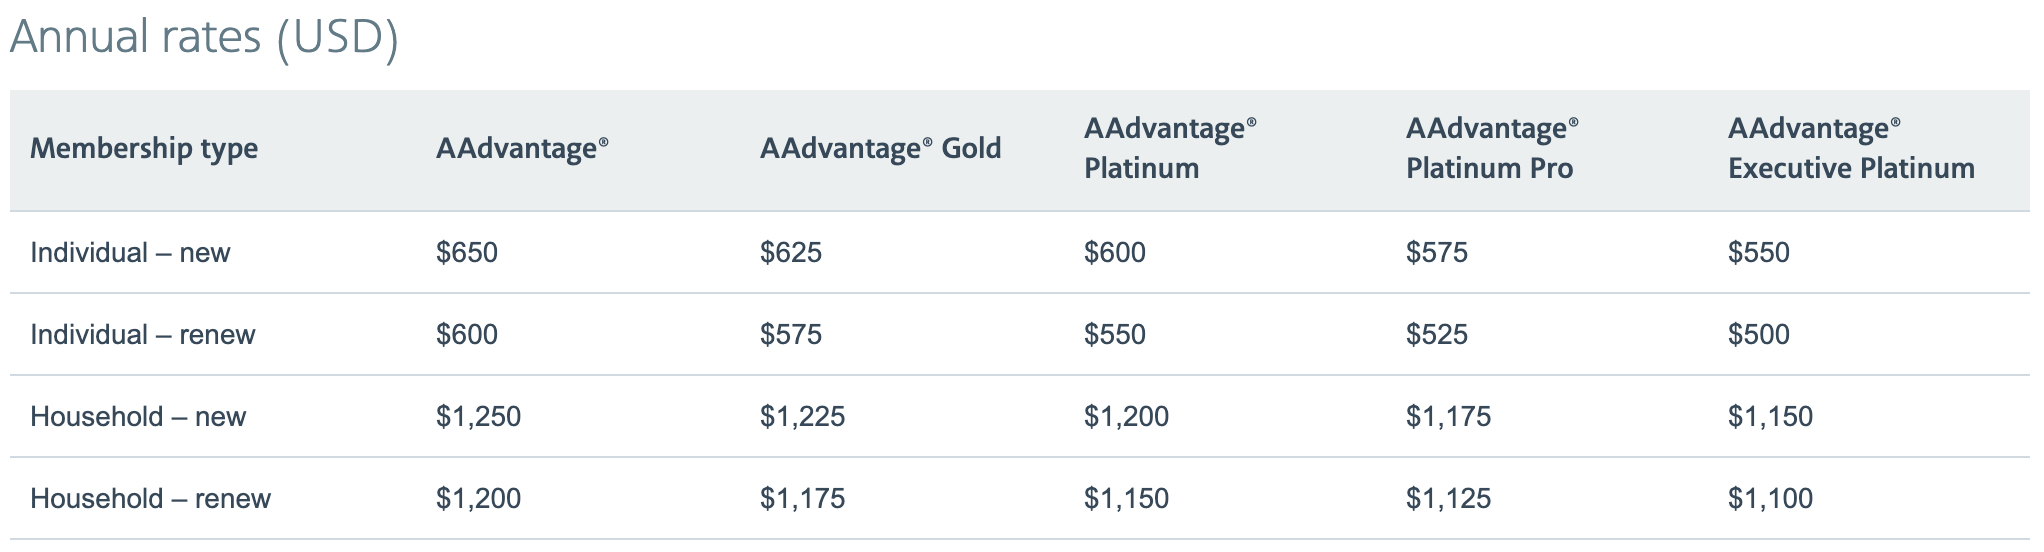 American Airlines Admirals Club membership rates